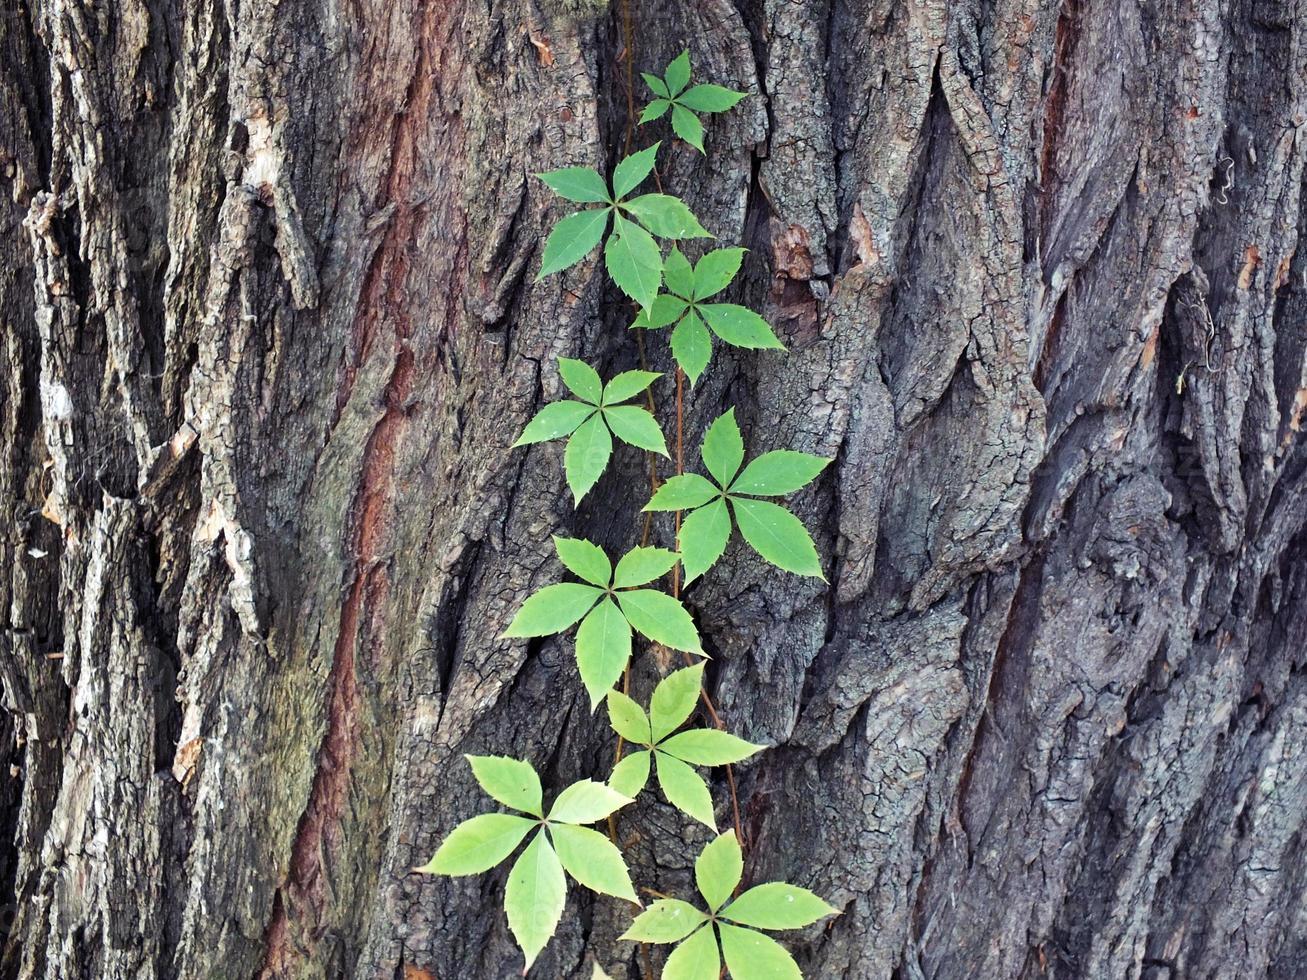 Kriechpflanze foto